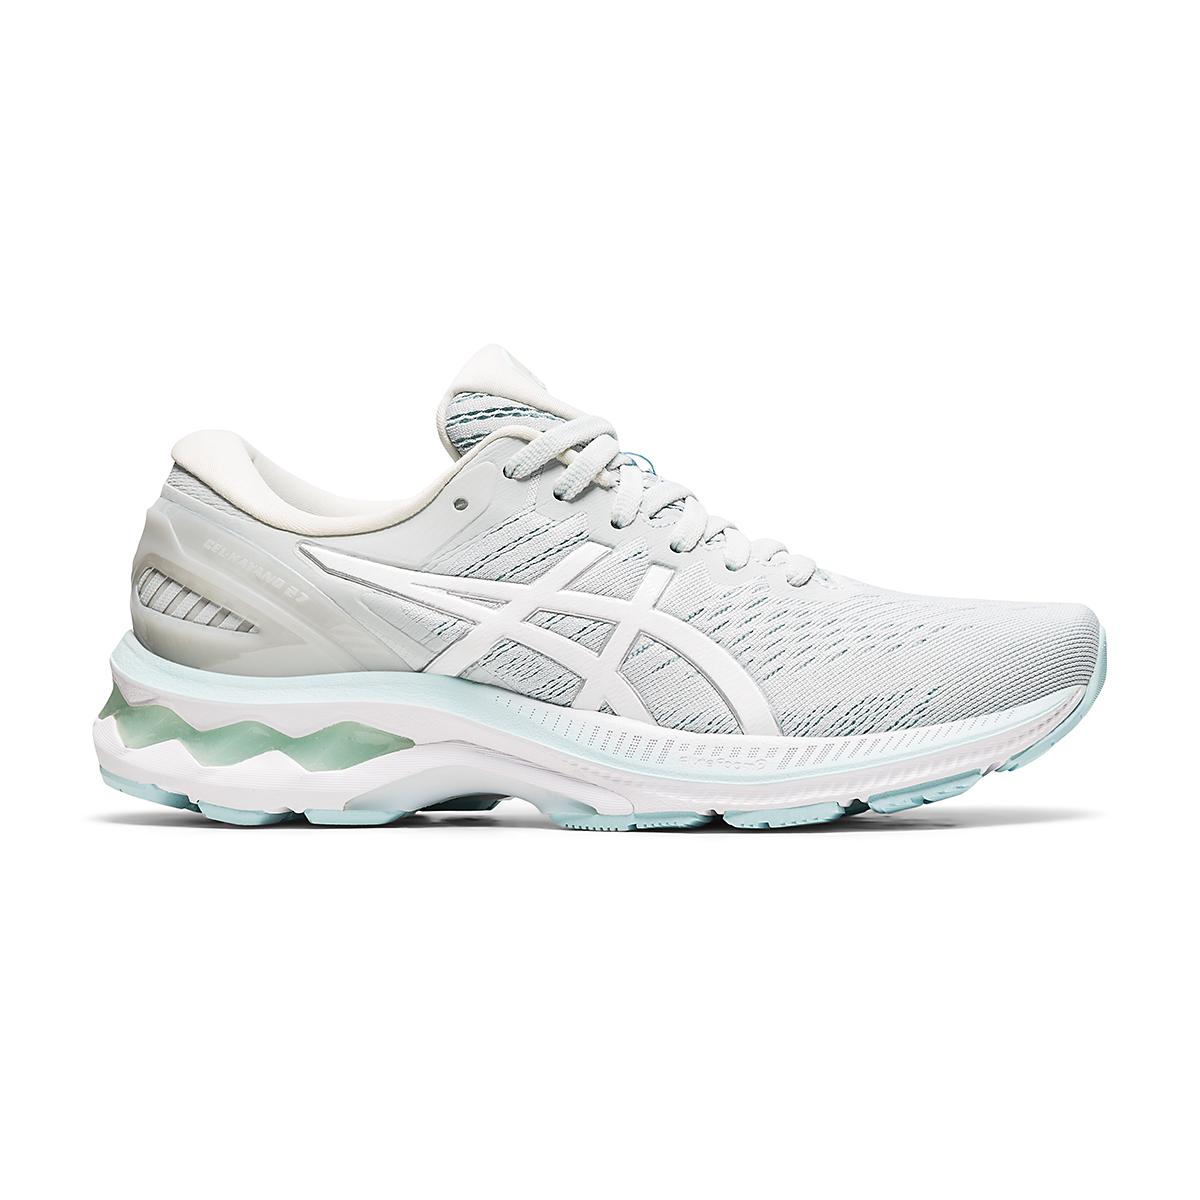 Women's Asics GEL-Kayano 27 Running Shoe - Color: Glacier Grey/White - Size: 6 - Width: Regular, Glacier Grey/White, large, image 1